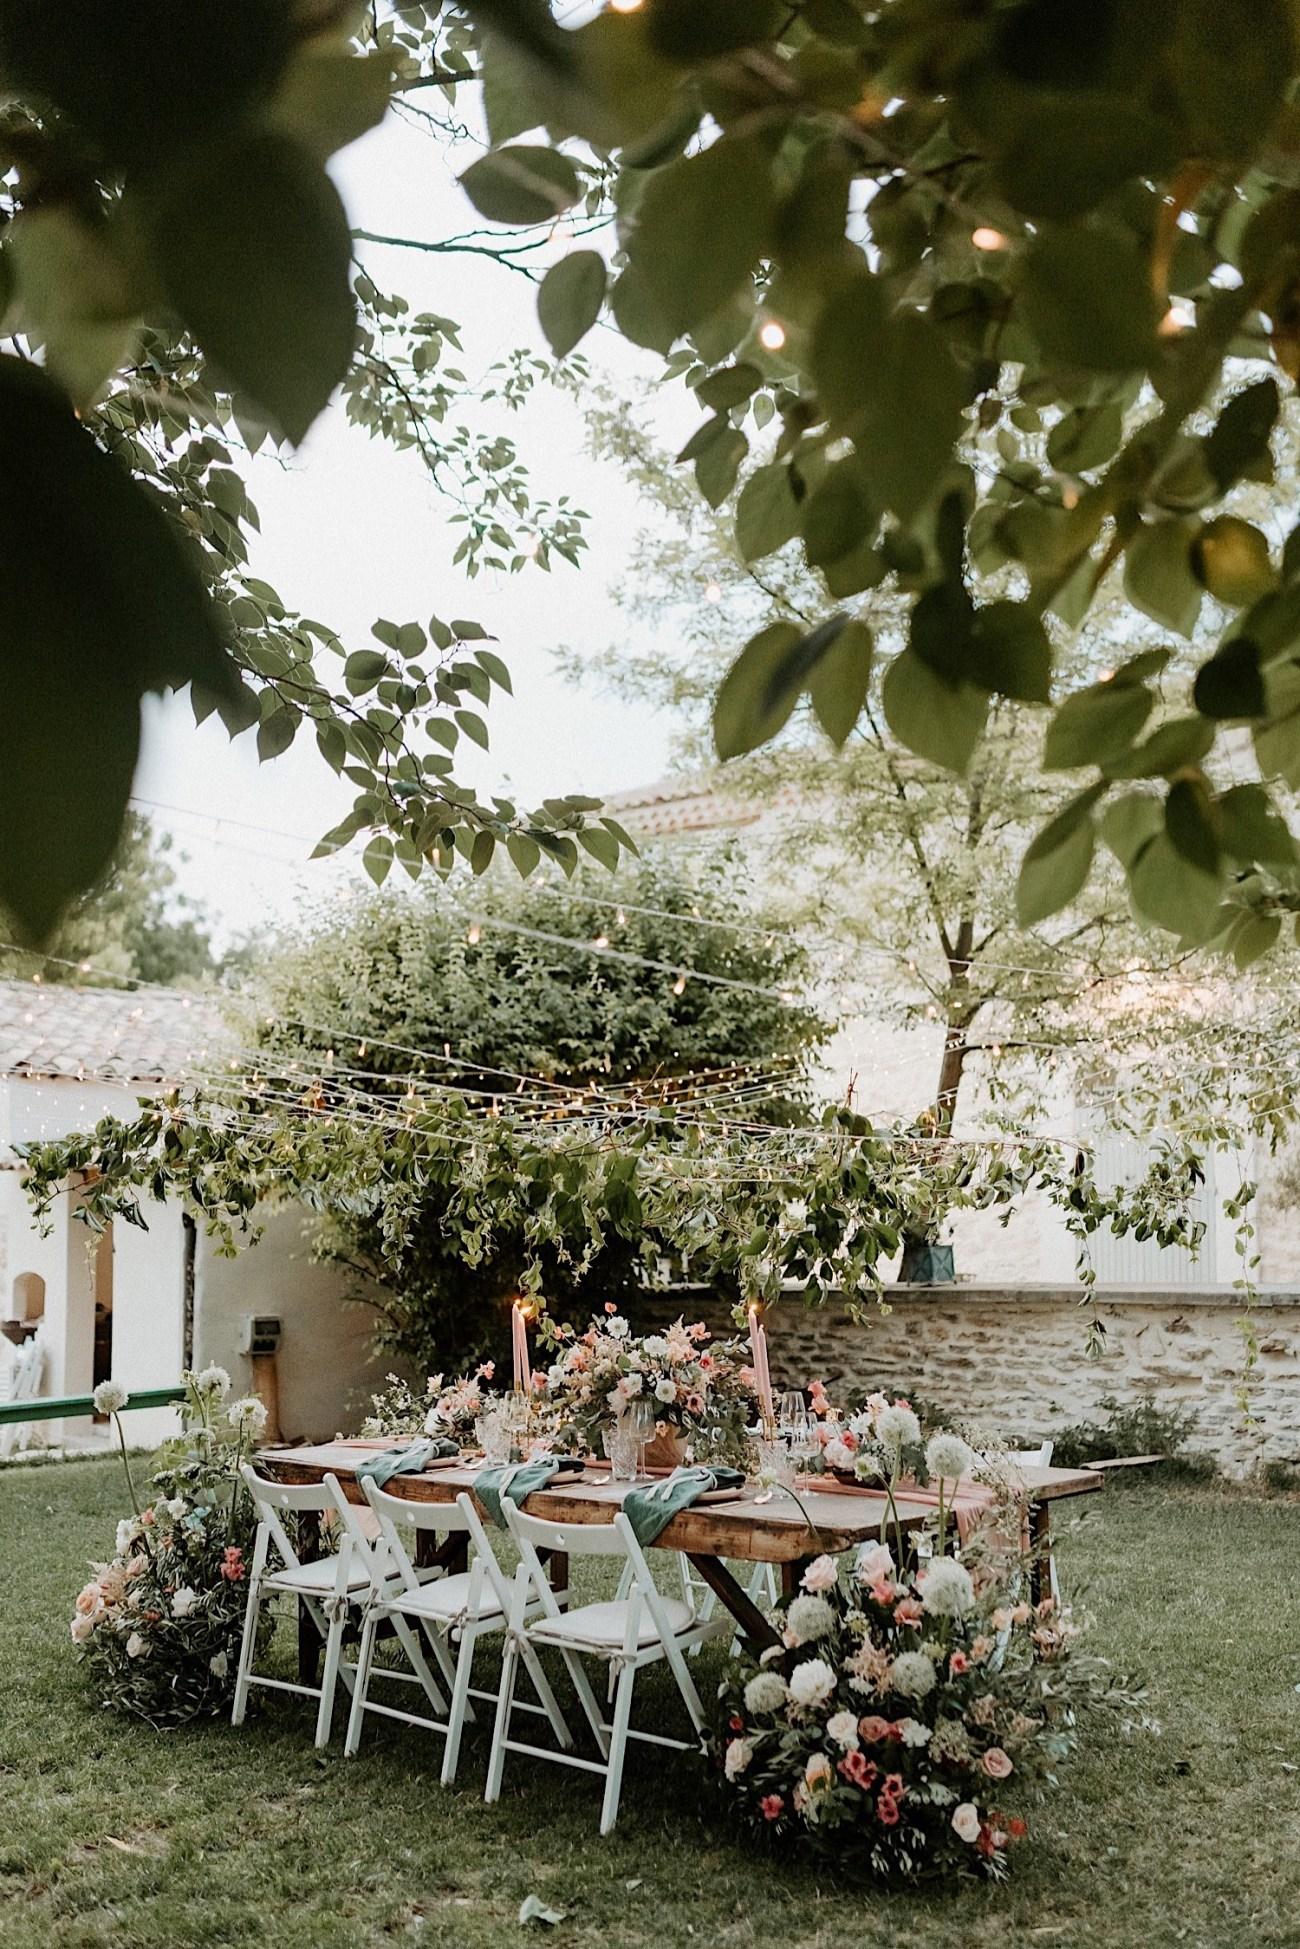 Terre Ugo Un Marriage En Provence Lavender Field Wedding French Wedding Provence Wedding Destination Wedding France Photographe De Marriage Provence France Anais Possamai Photography 34